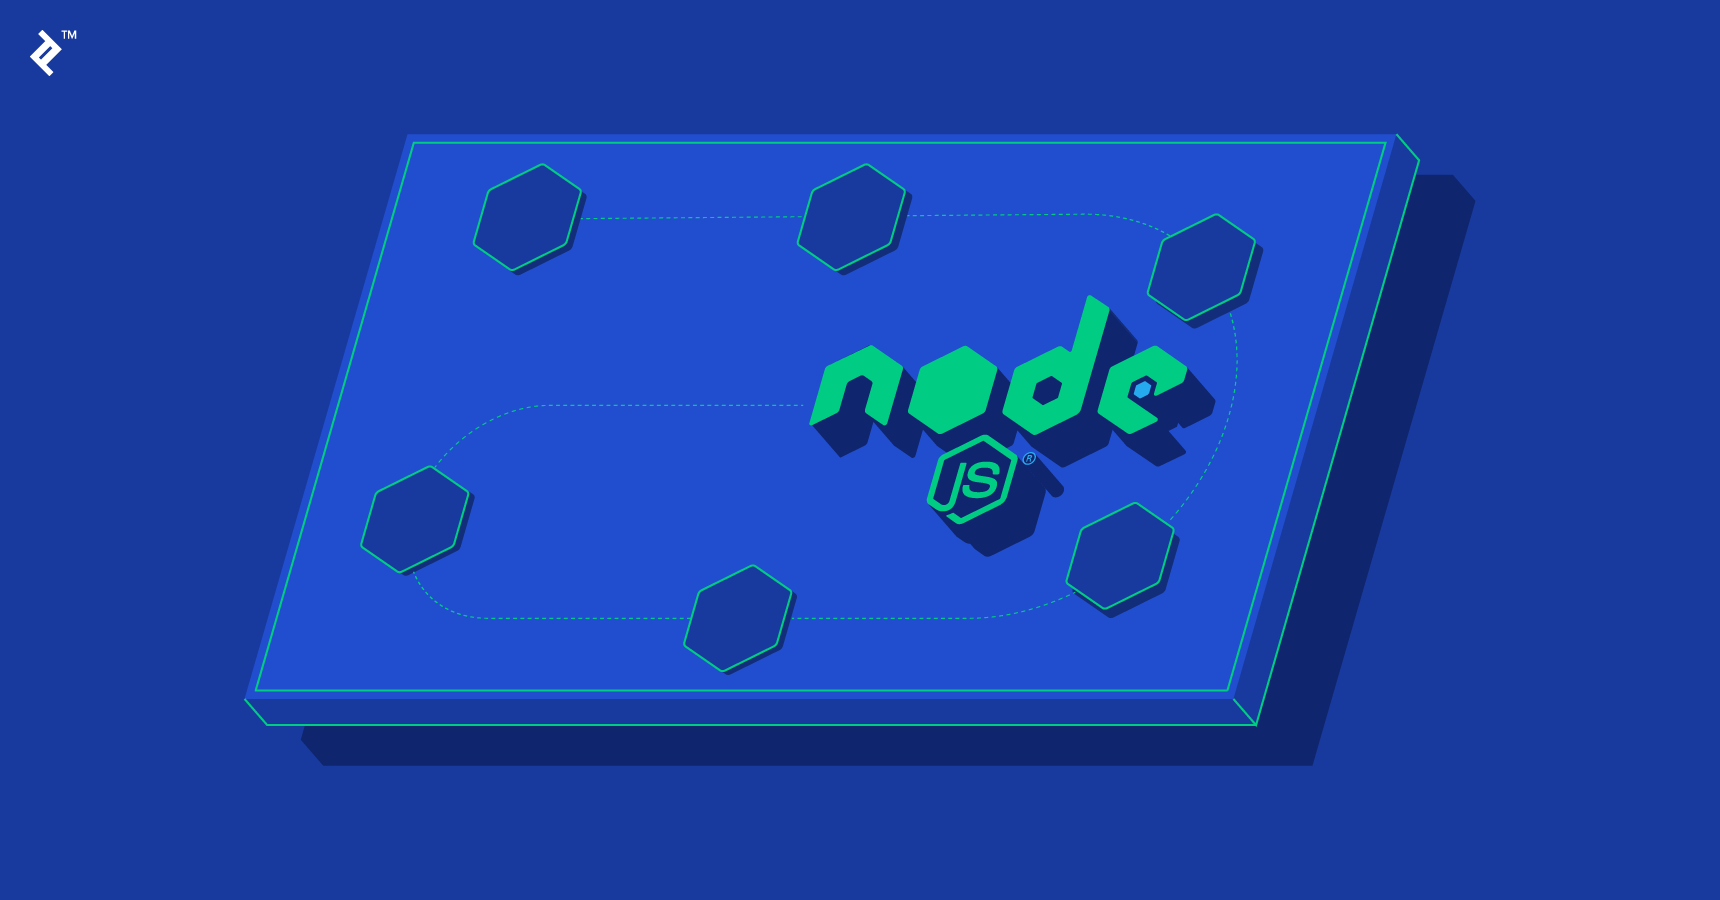 Top 5 NodeJs Development Company List